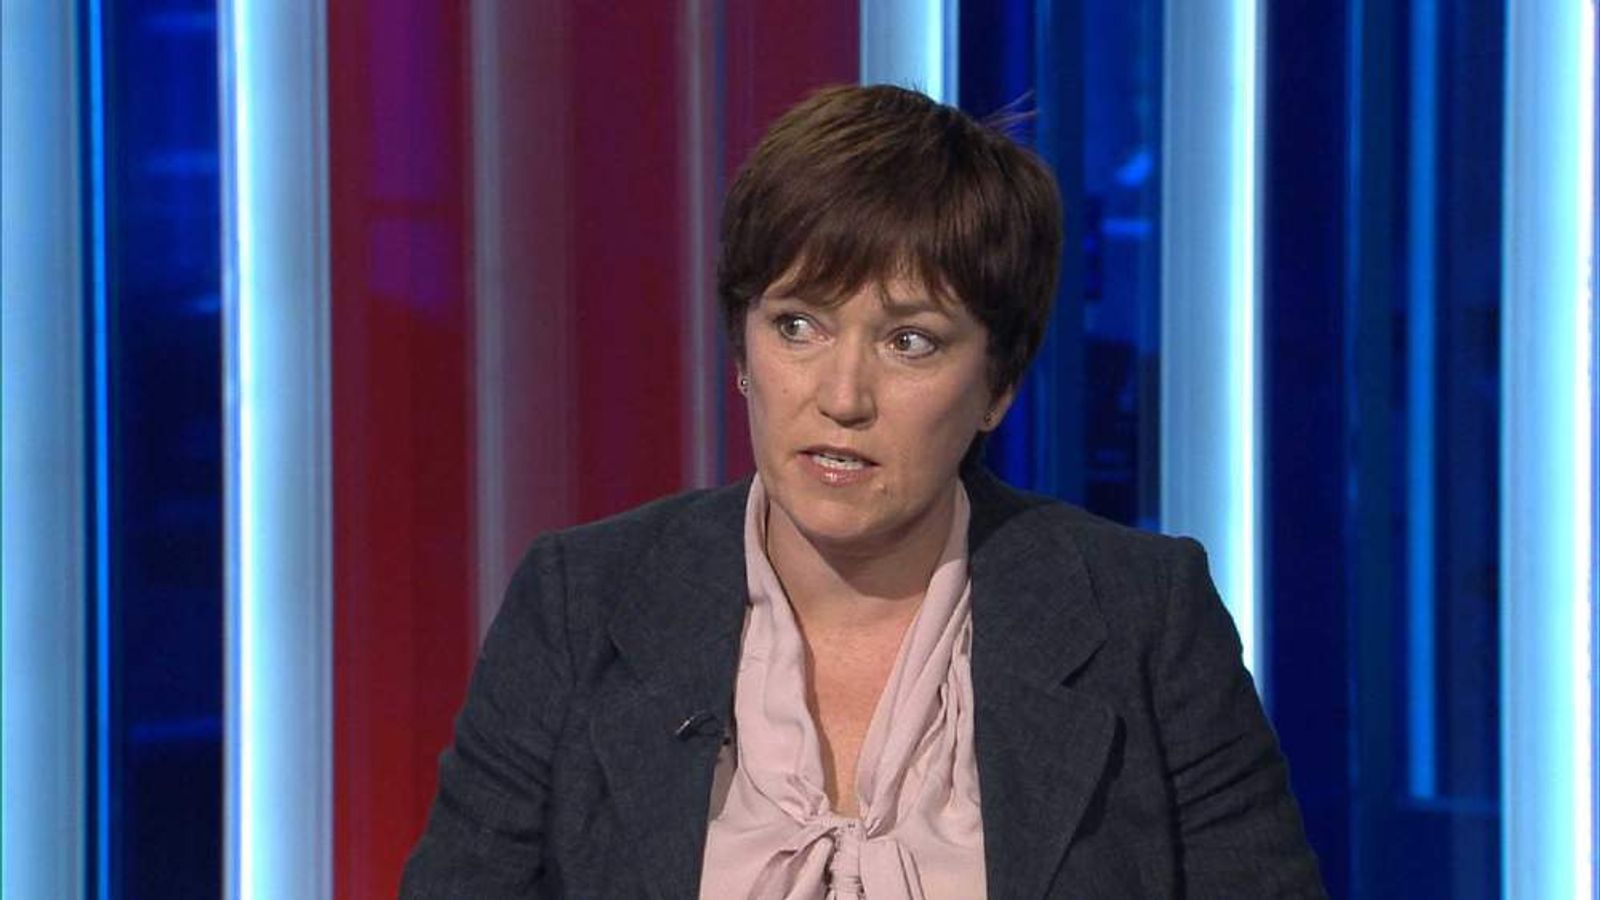 NHS whistleblower Dr Kim Holt